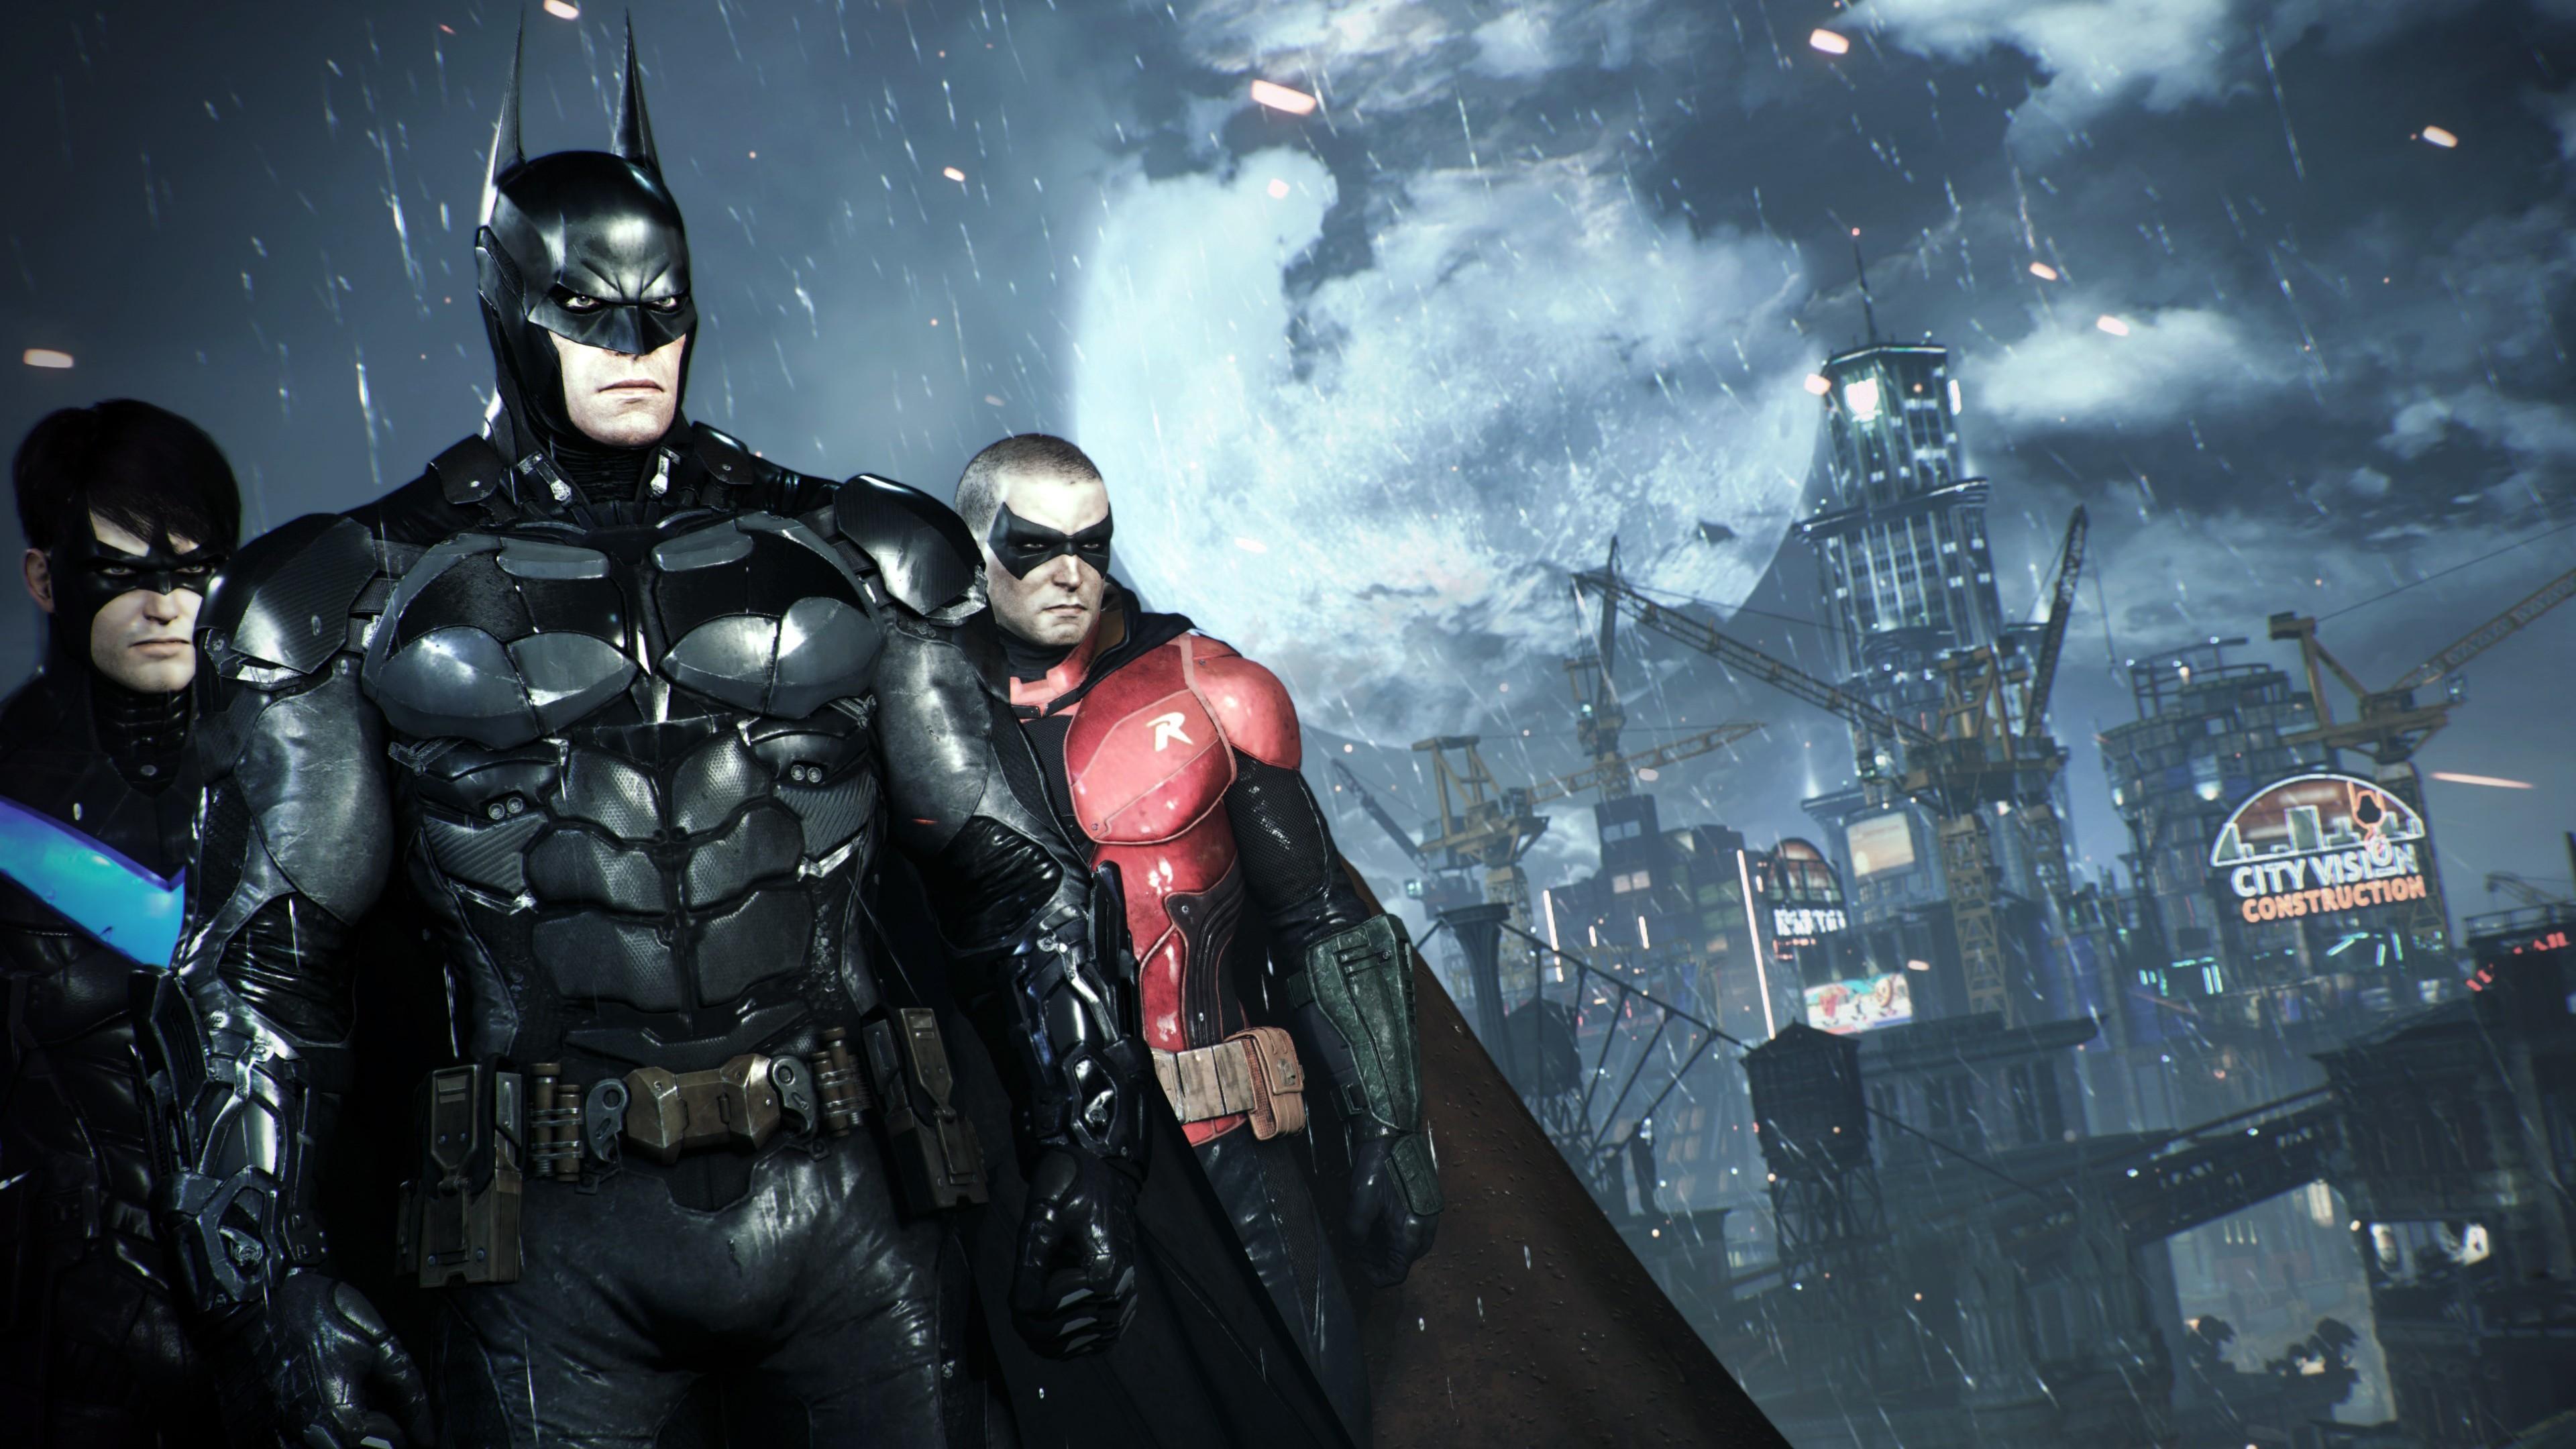 Batman Arkham Knight Wallpapers 80 Images